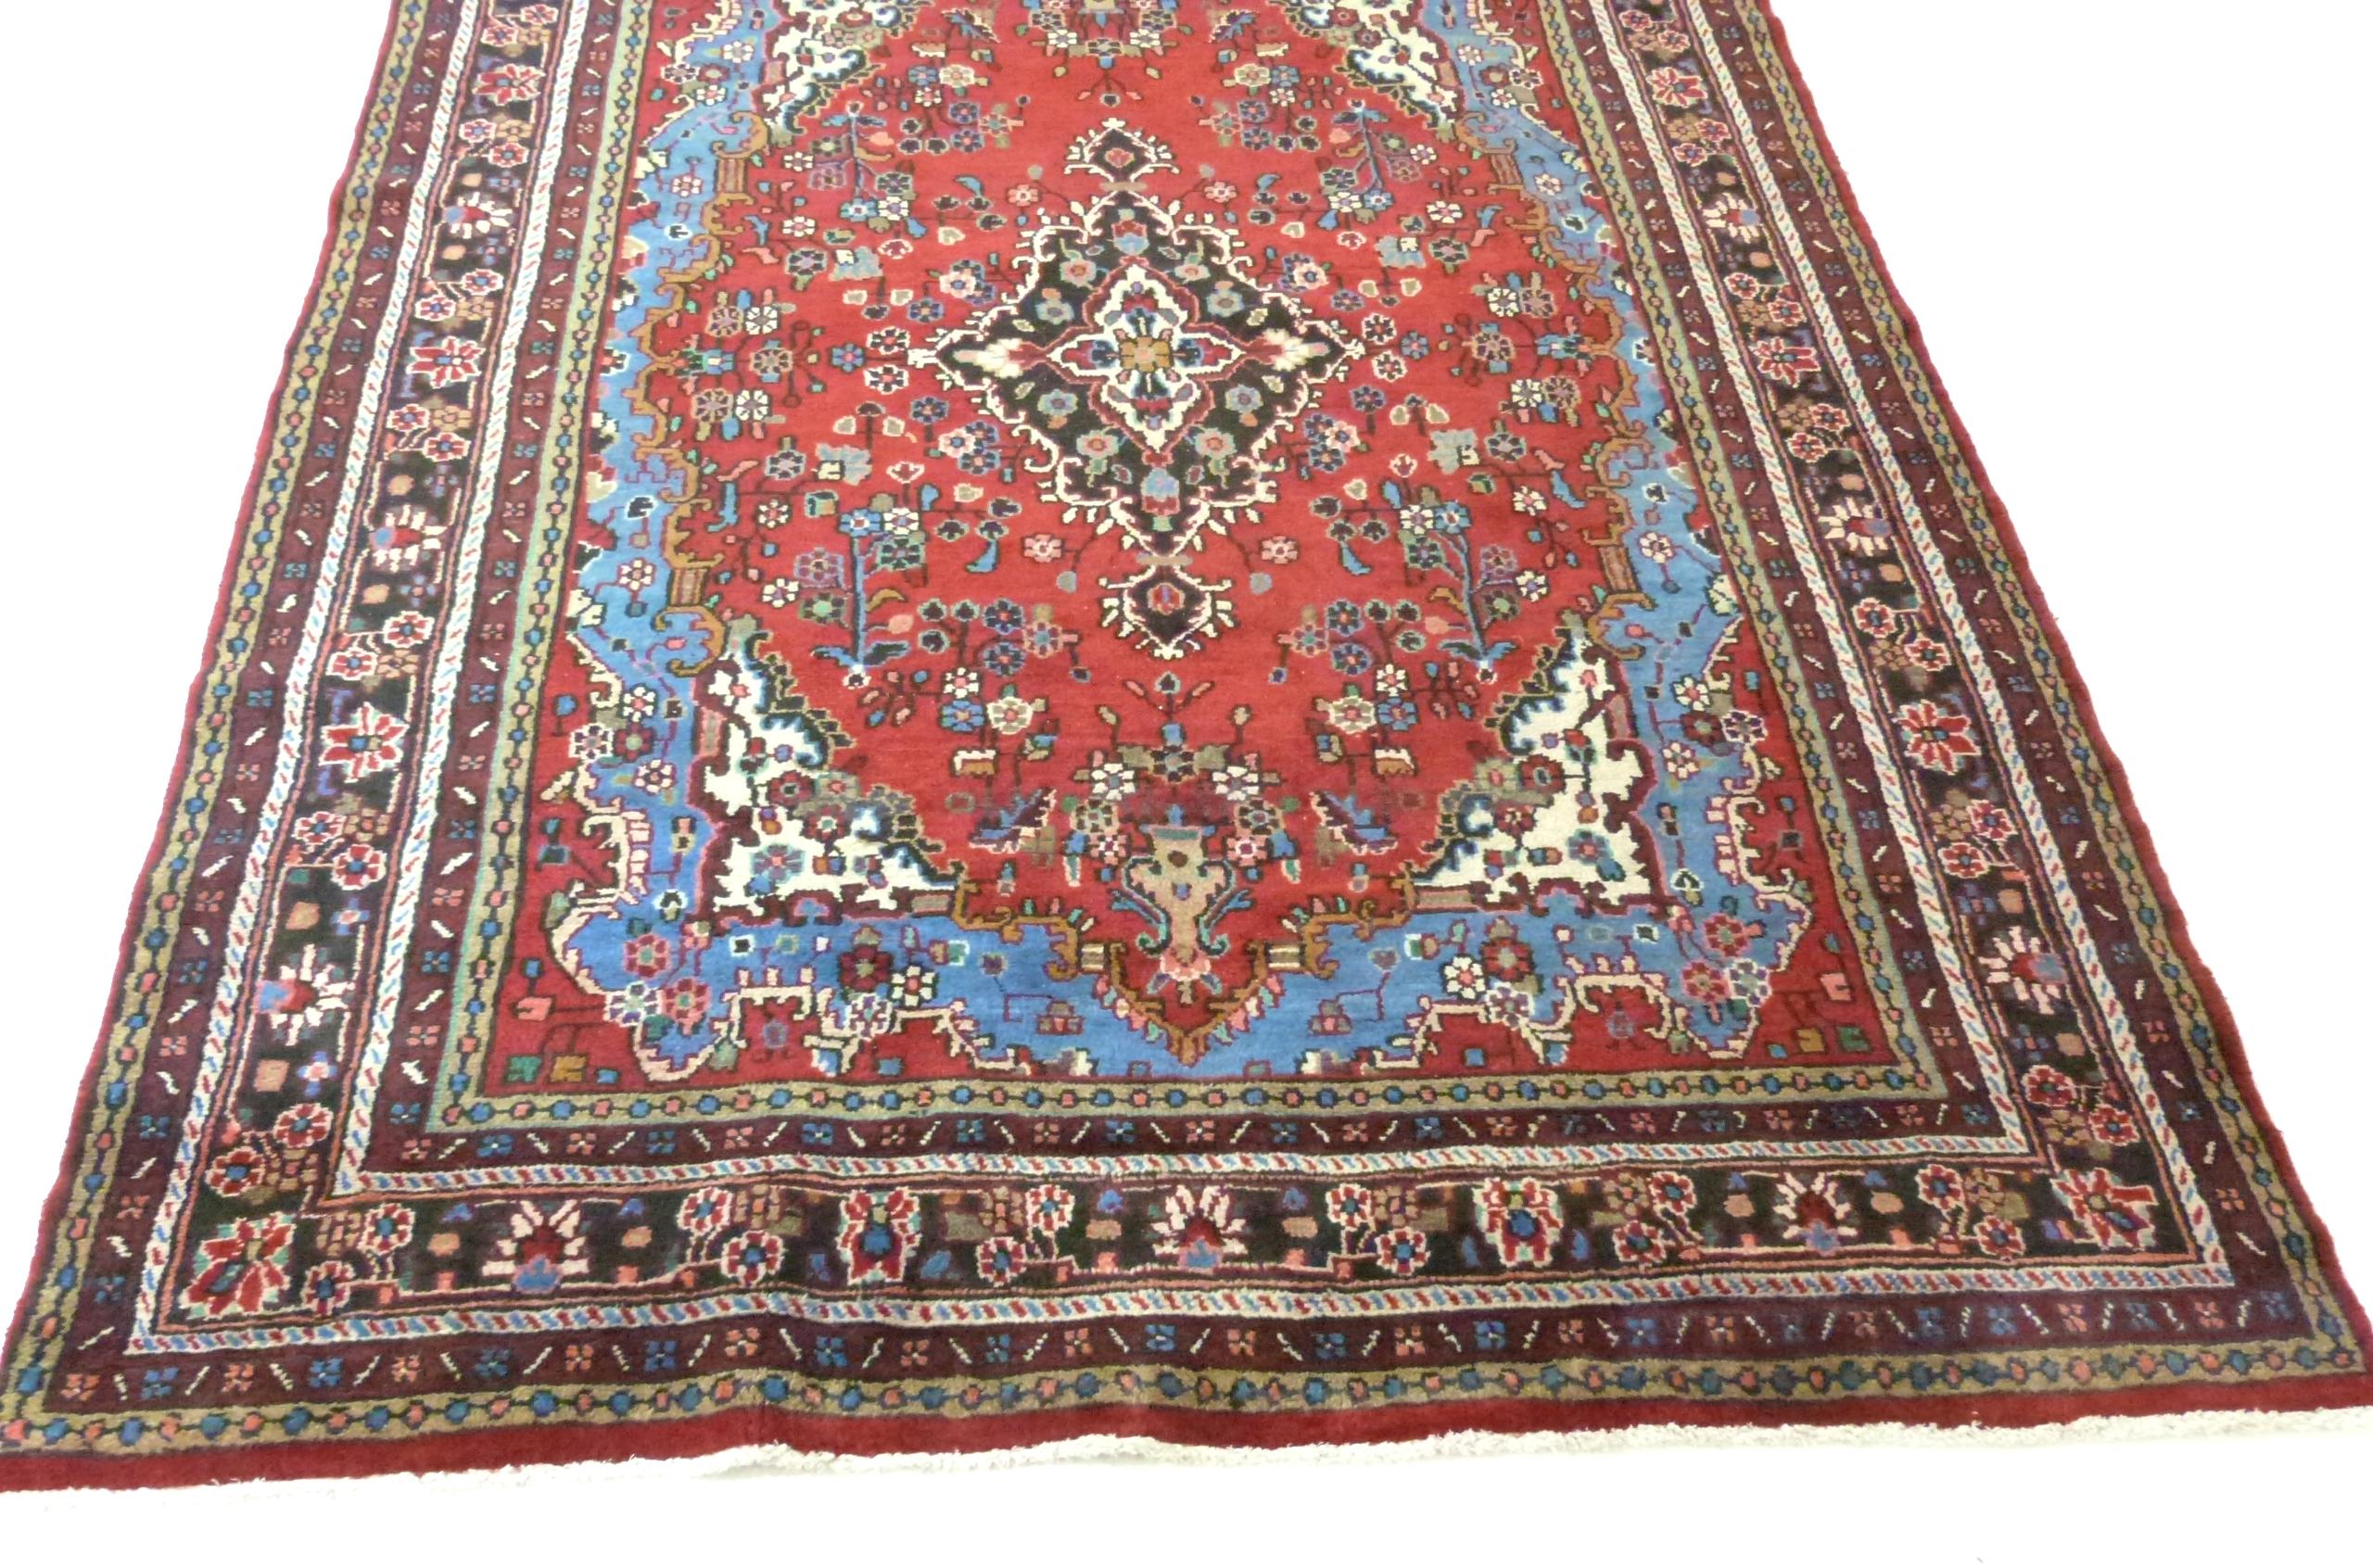 Rich red ground full pile Persian Serouke Carpet, floral medallion design 296cm x 200cm - Image 2 of 8